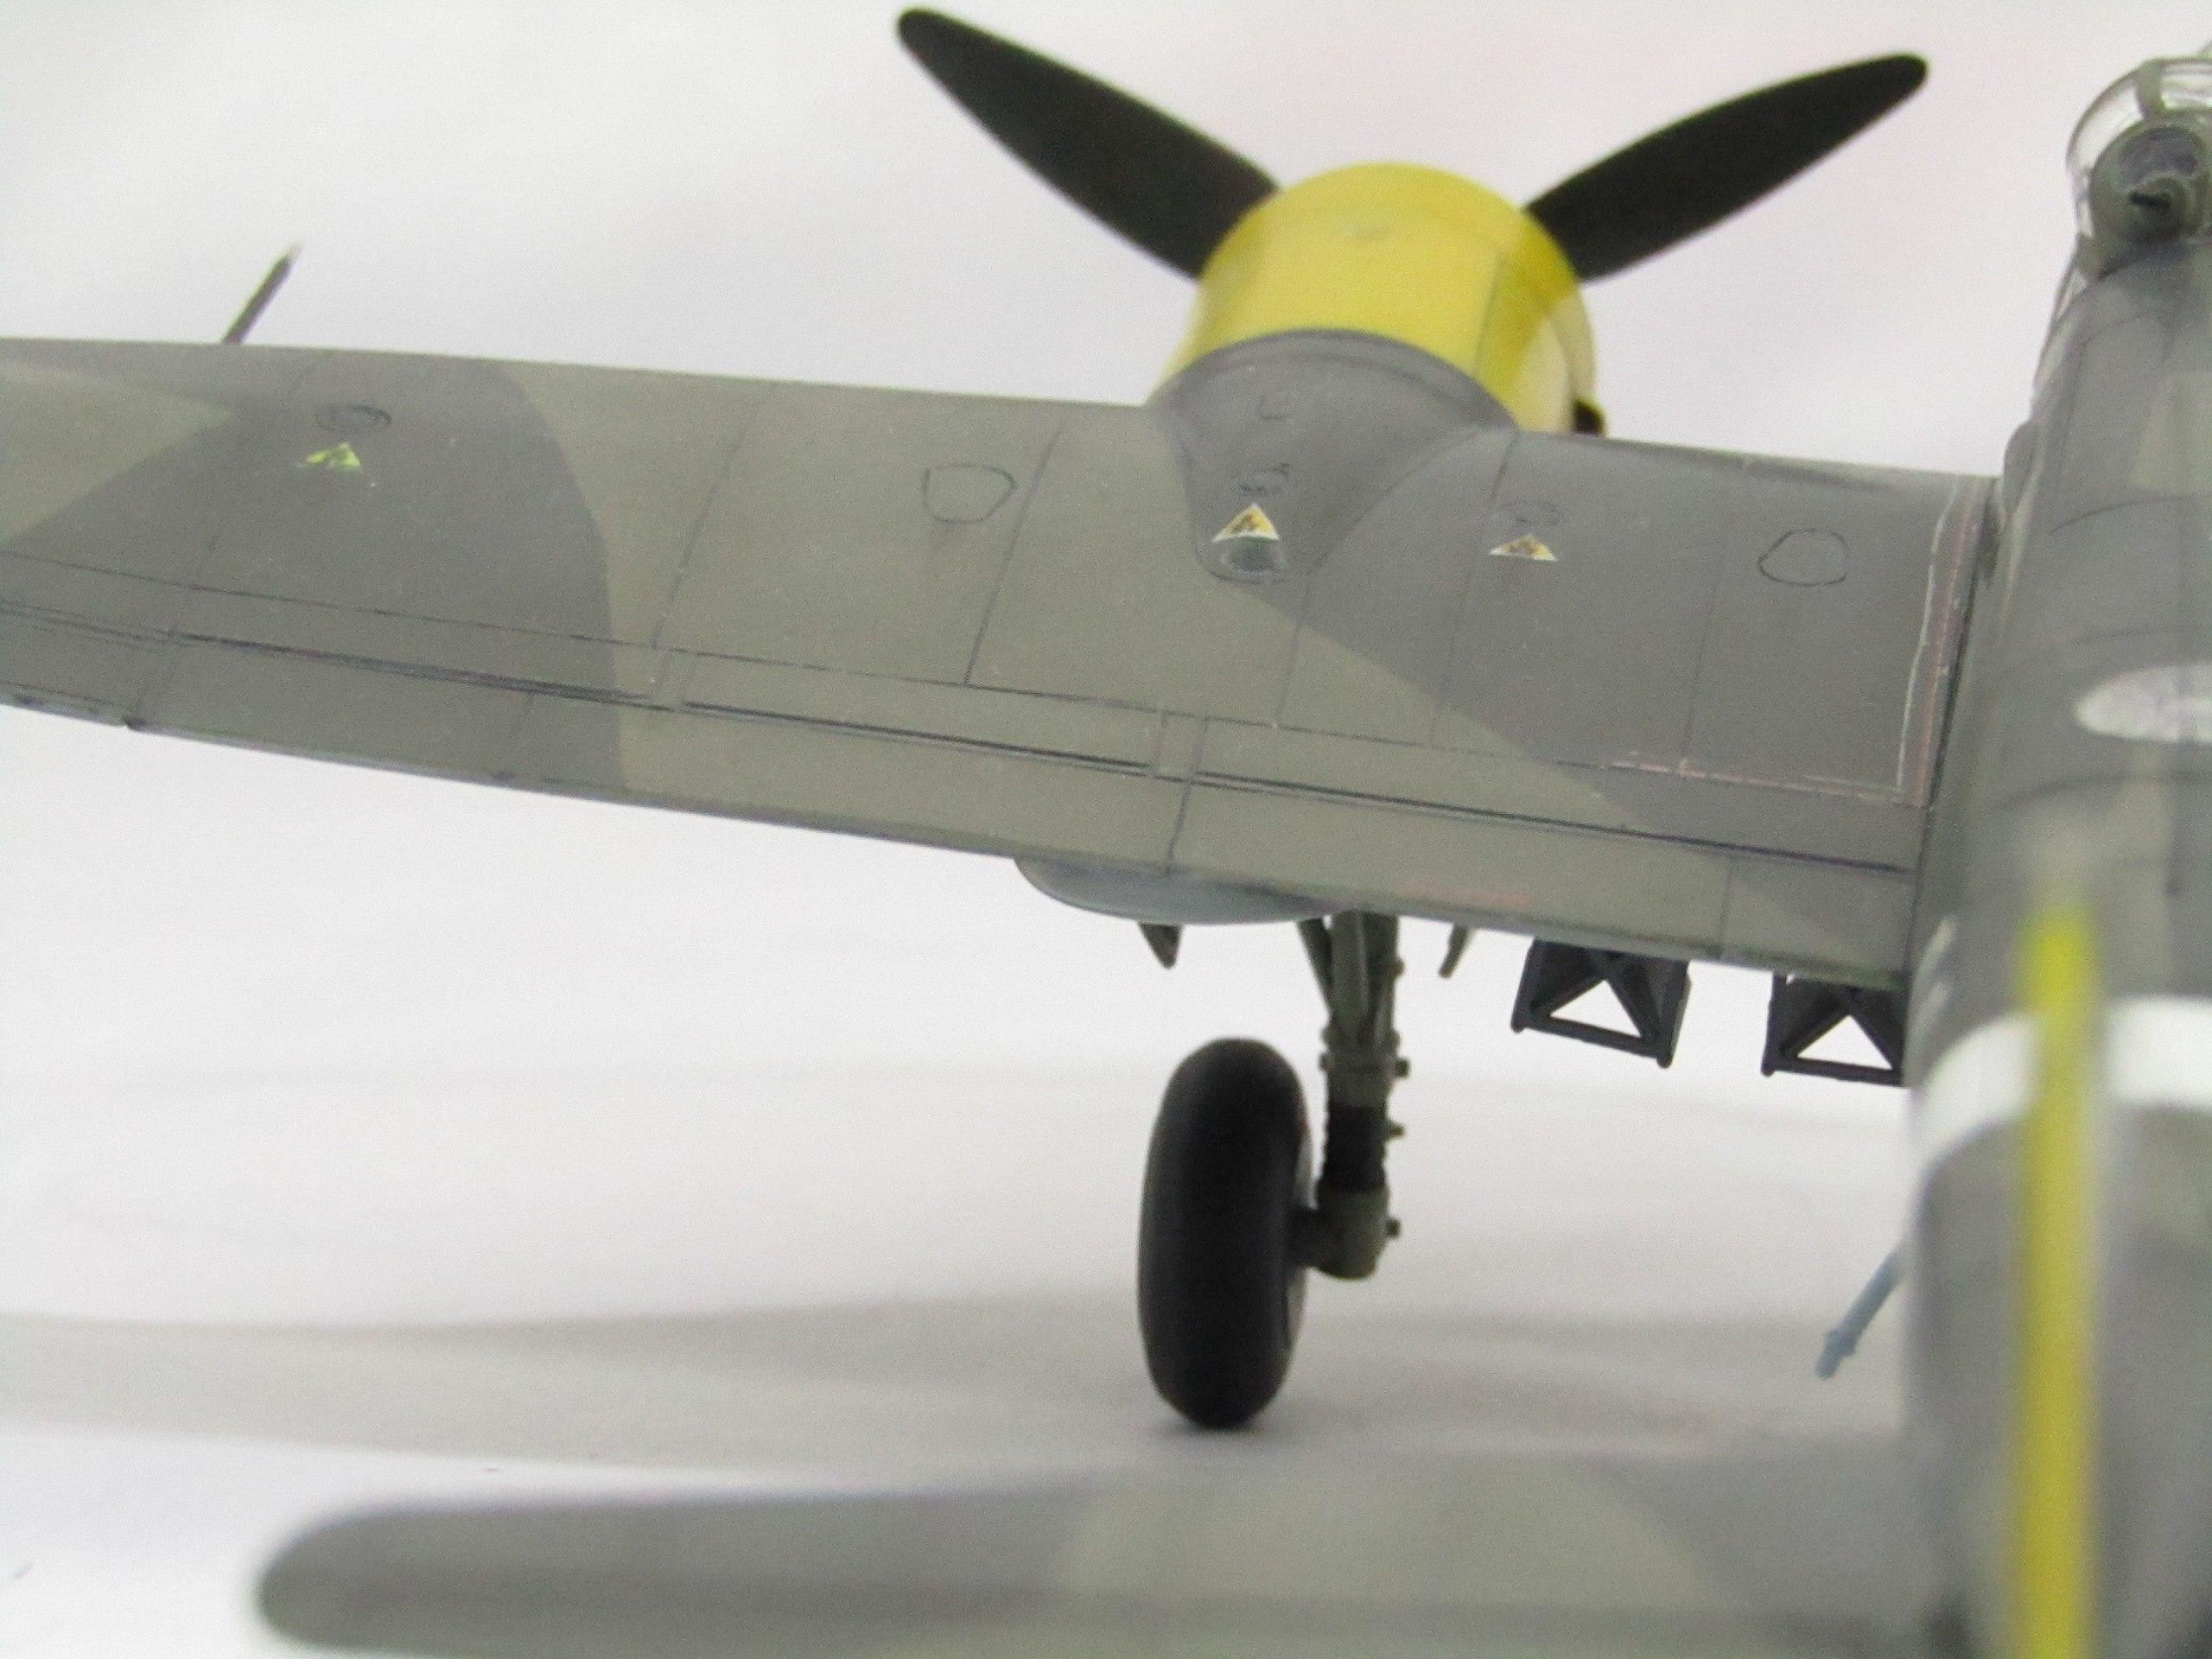 Ju-88 A-4 1/72 (Звезда) UM1tA6ayWEY